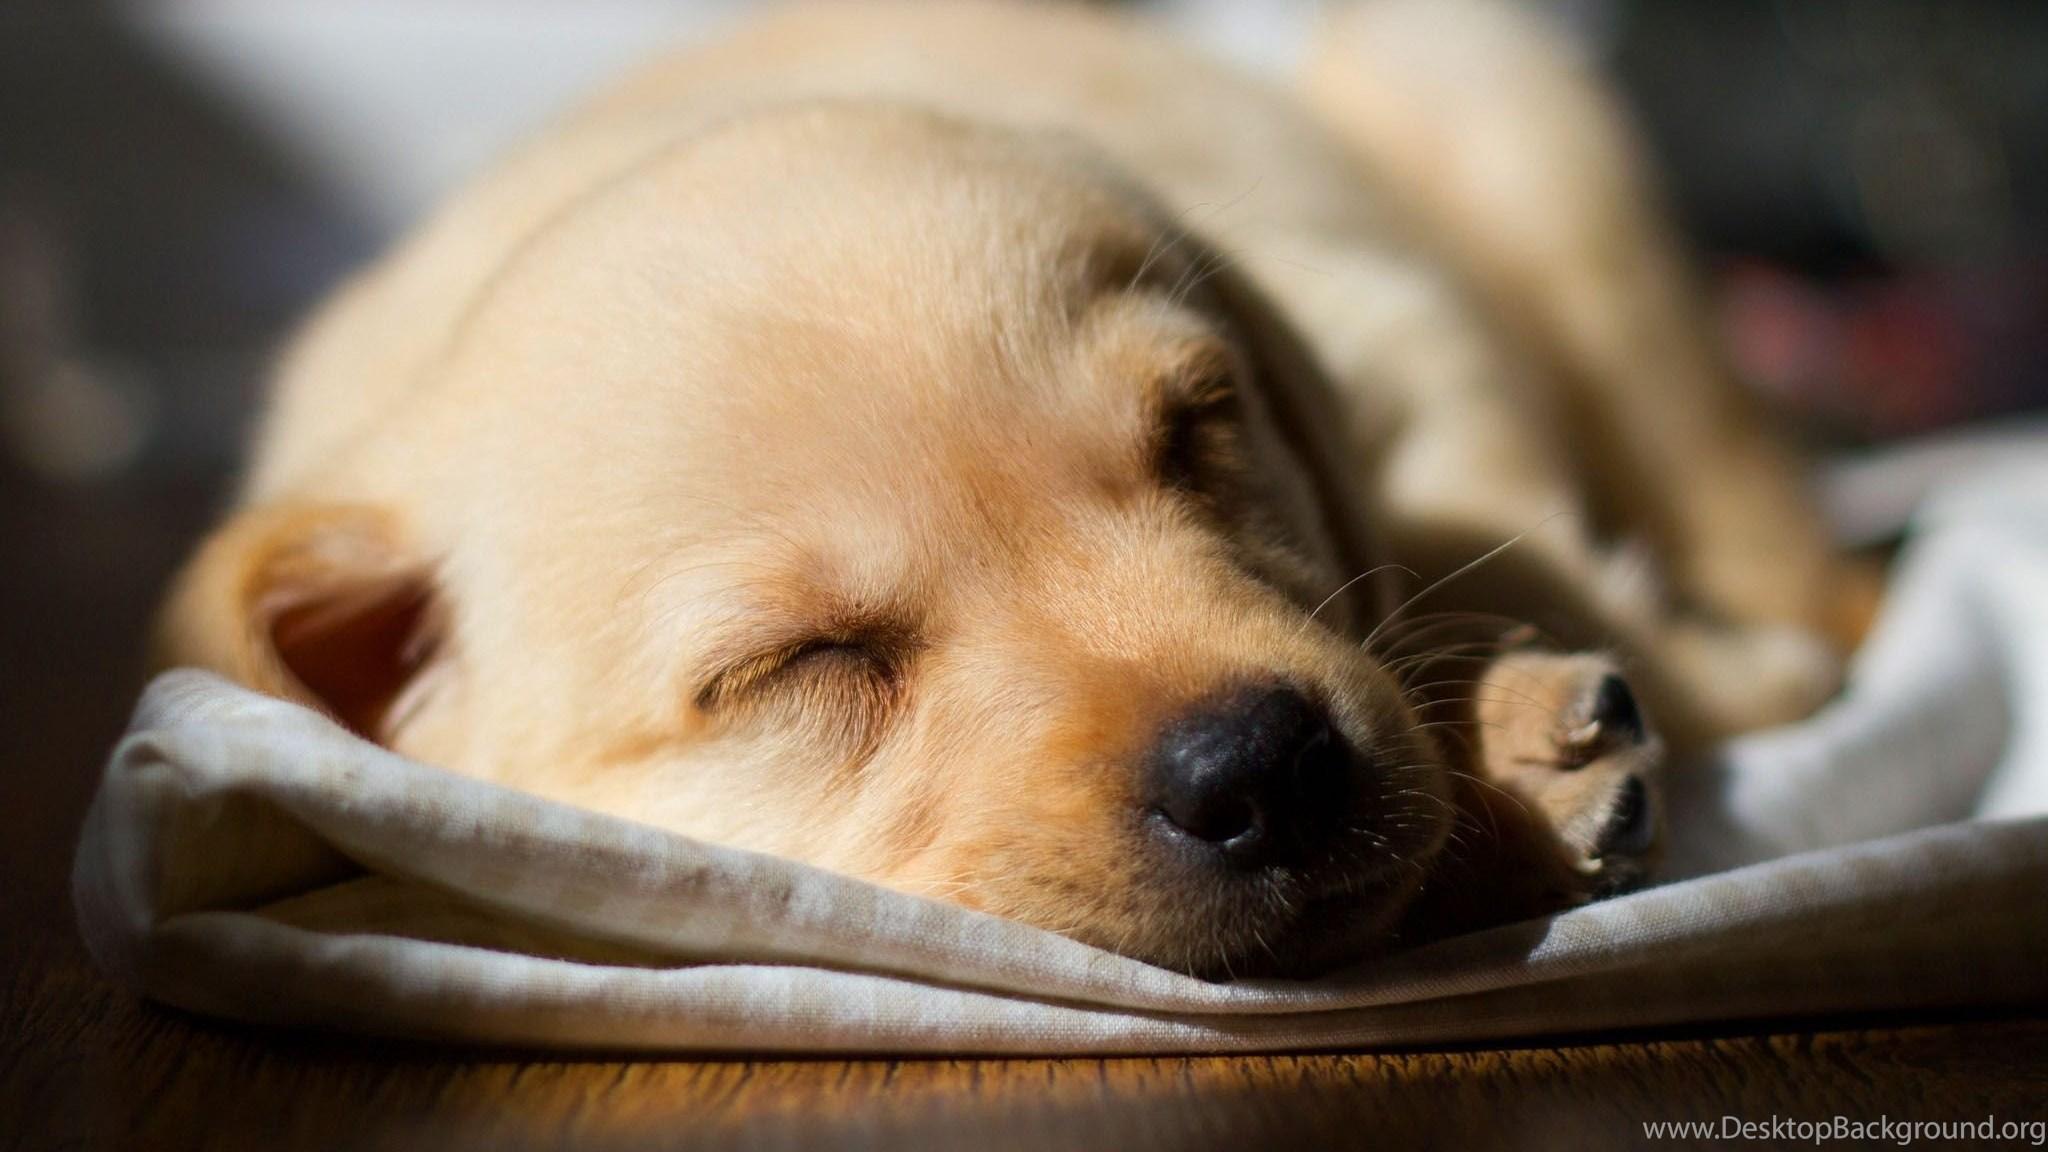 Labrador Sleeping Puppy Wallpaper HD Desktop Background